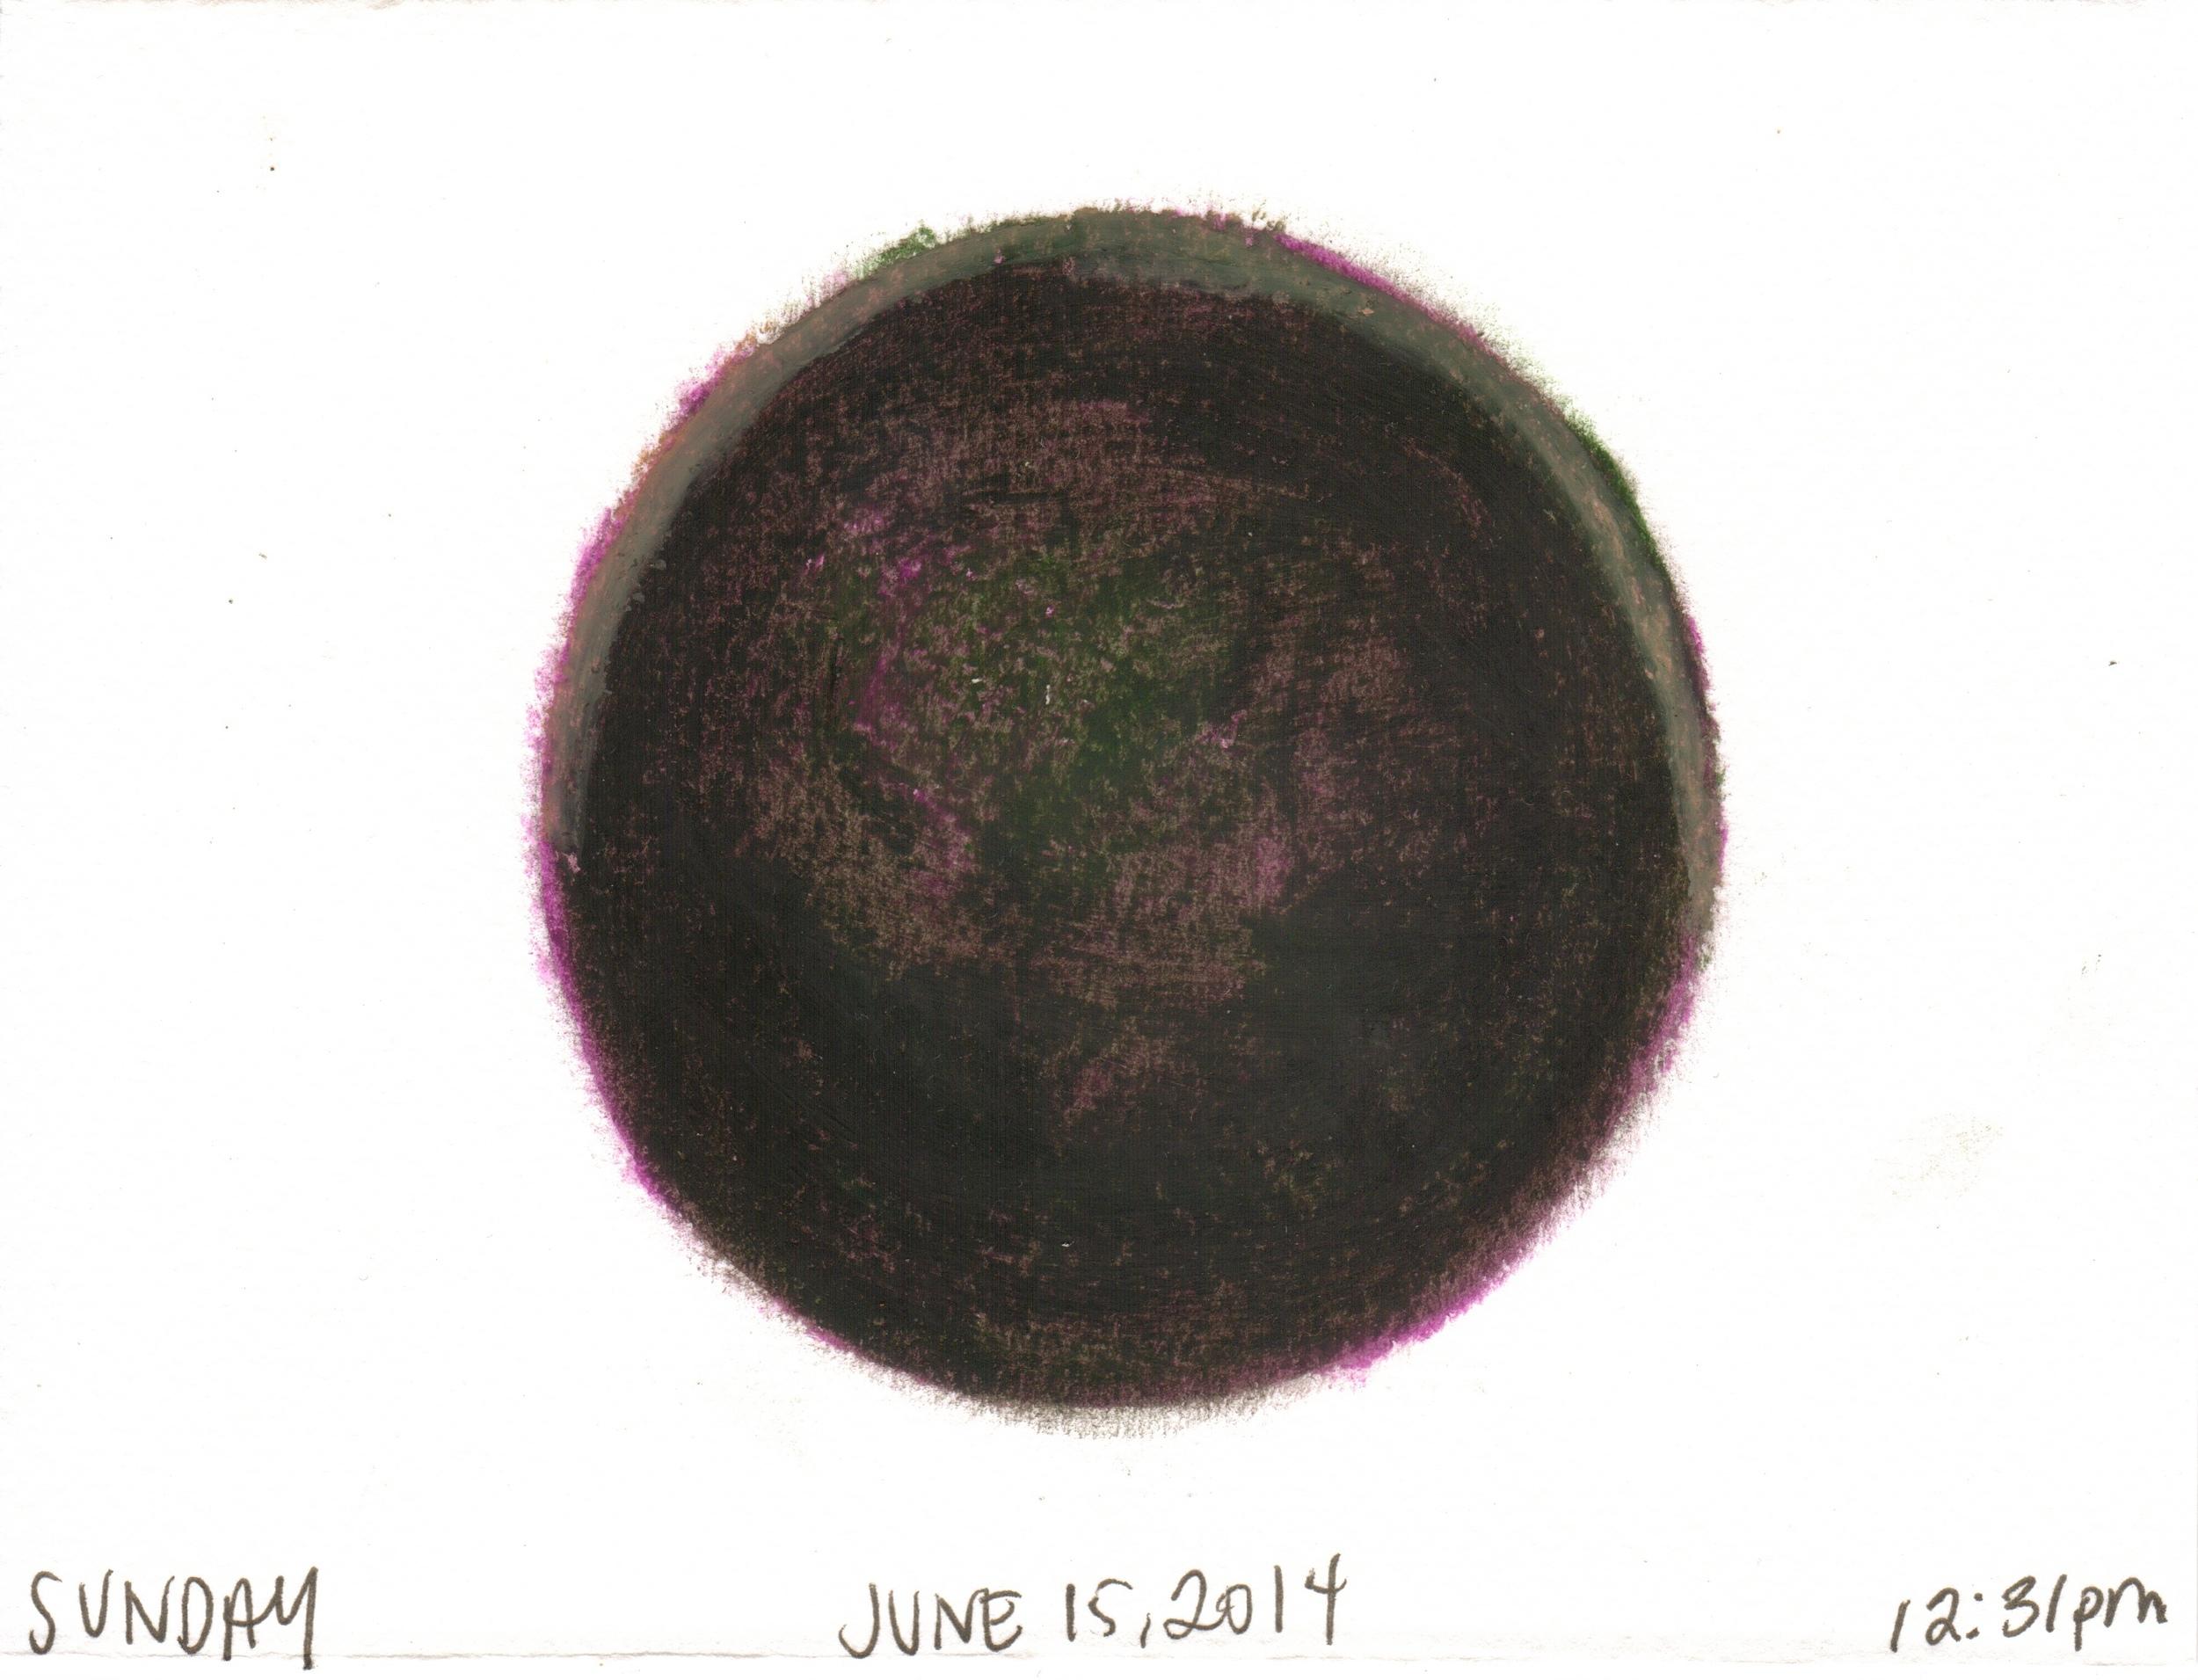 06.15.14